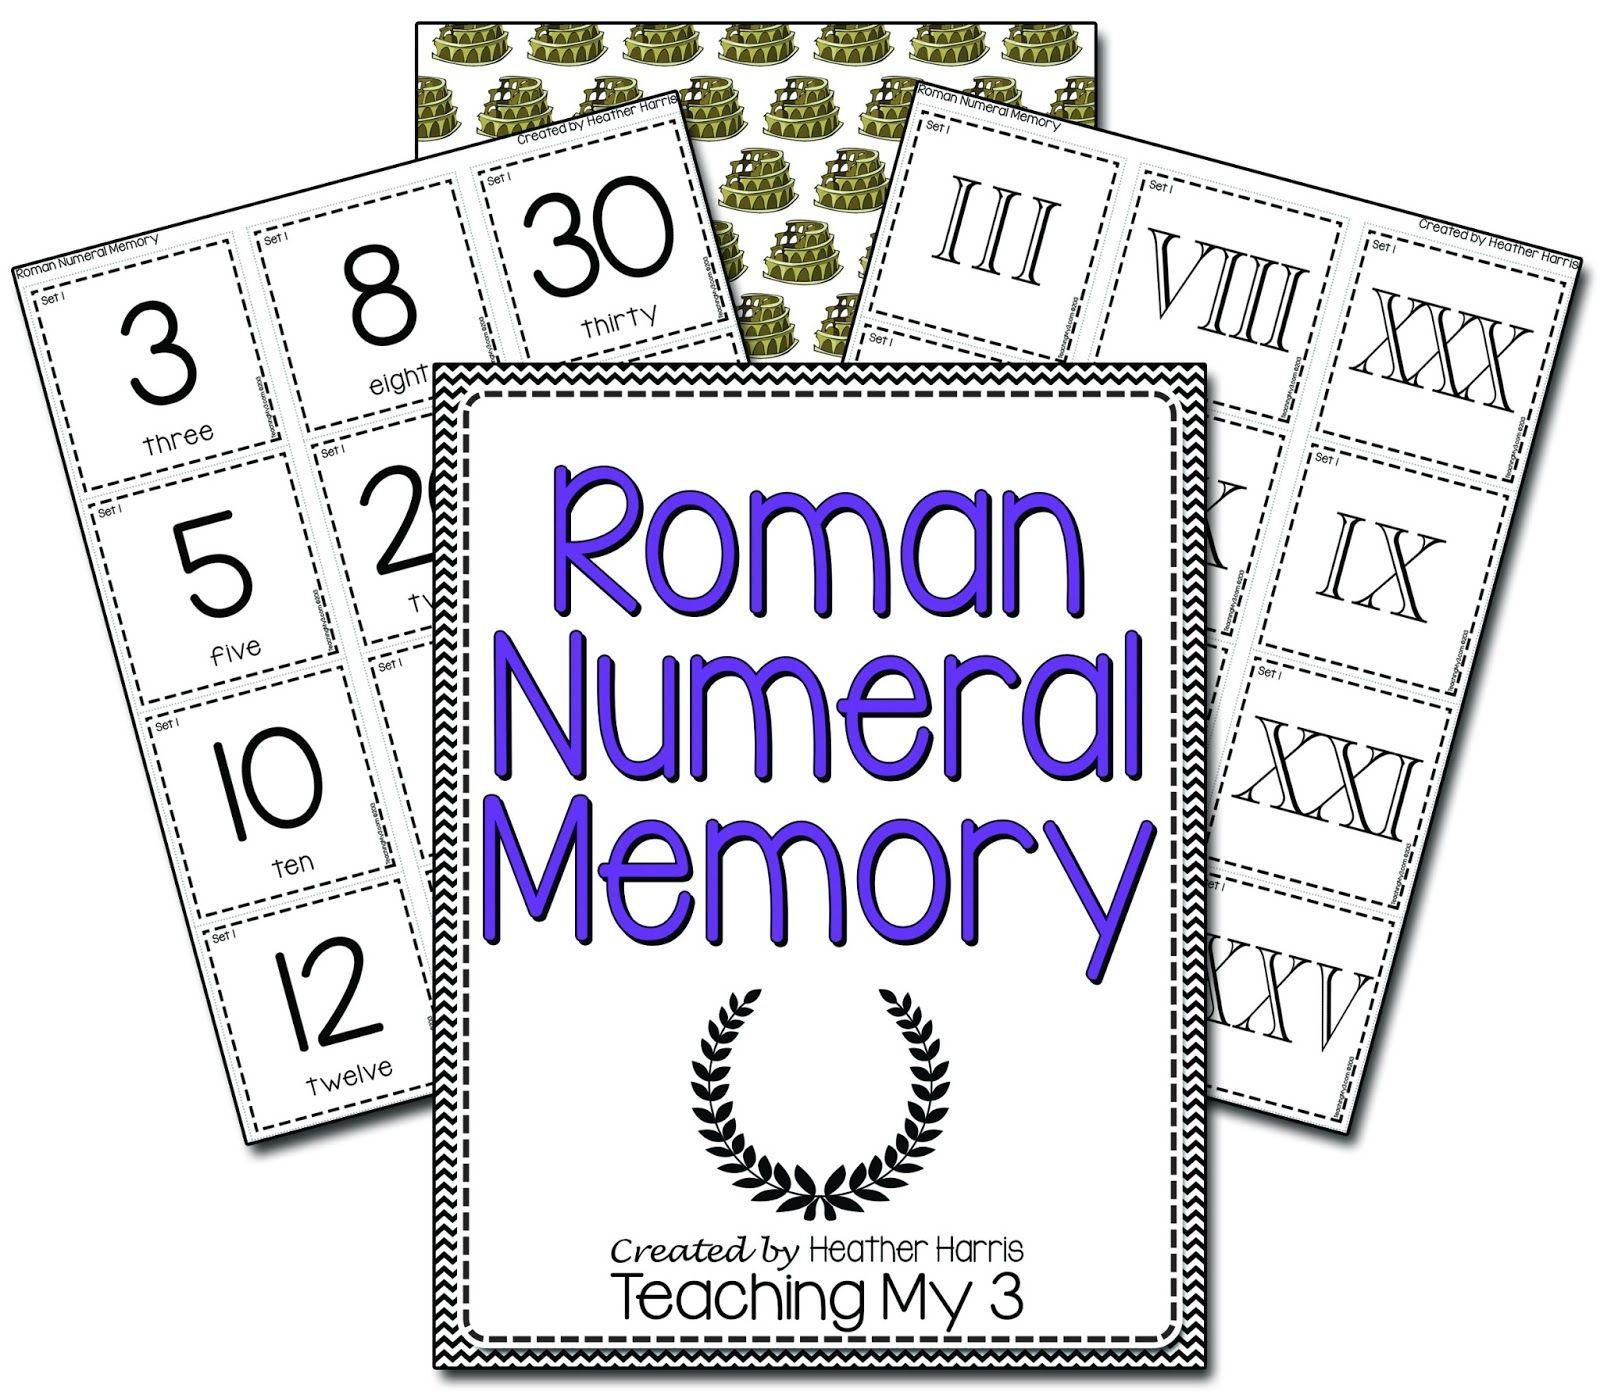 Roman Numeral Memory Fun Way To Learn Roman Numerals